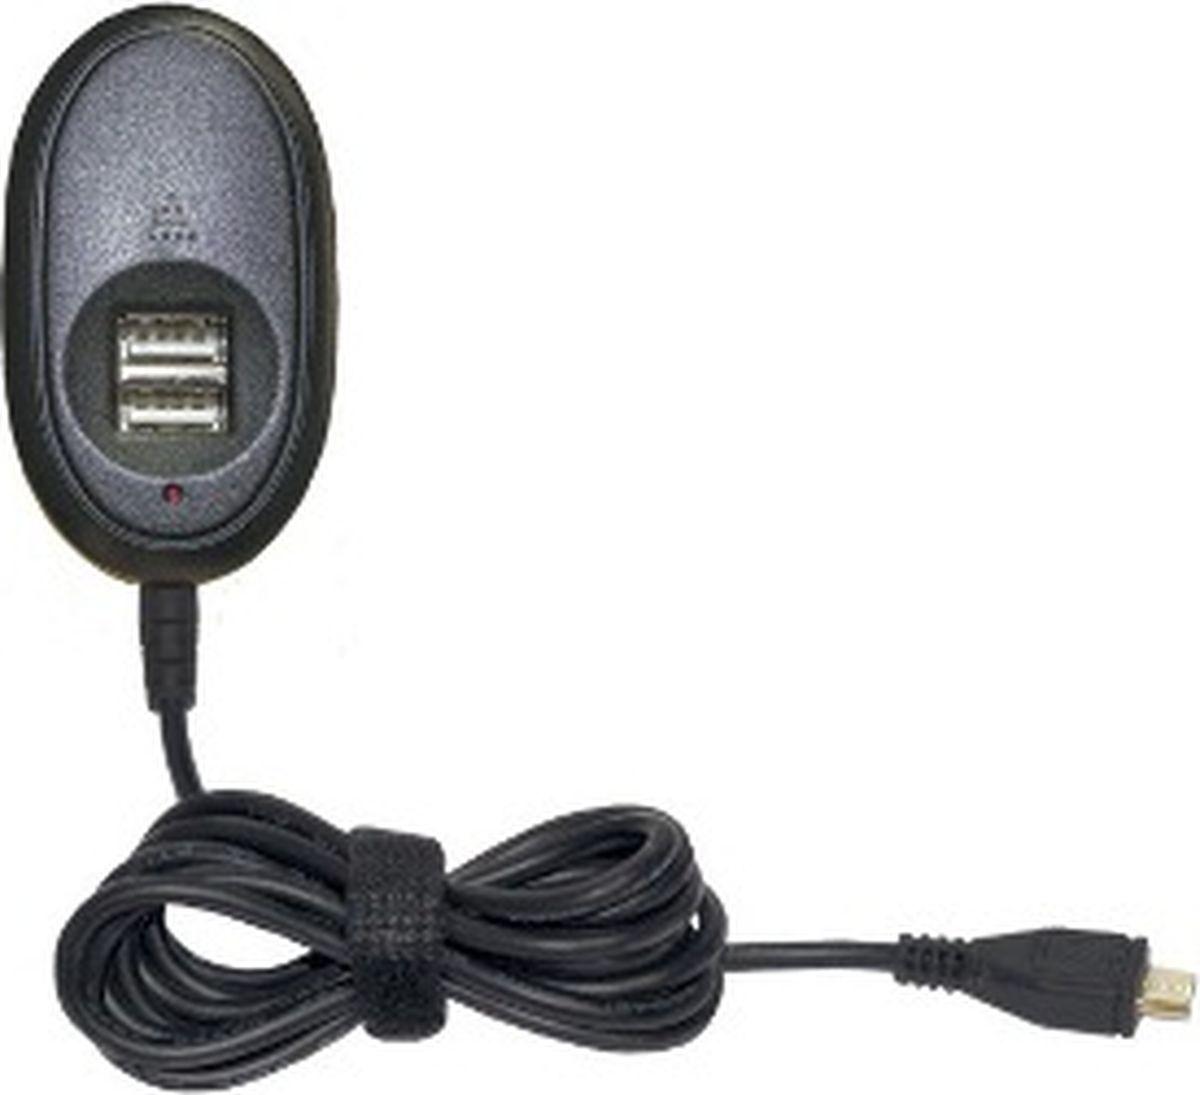 Ginzzu GA-3412UB, Black сетевое зарядное устройство + кабель micro USB зарядное устройство зарядное устройство сетевое qtek s200 htc p3300 ainy 1a